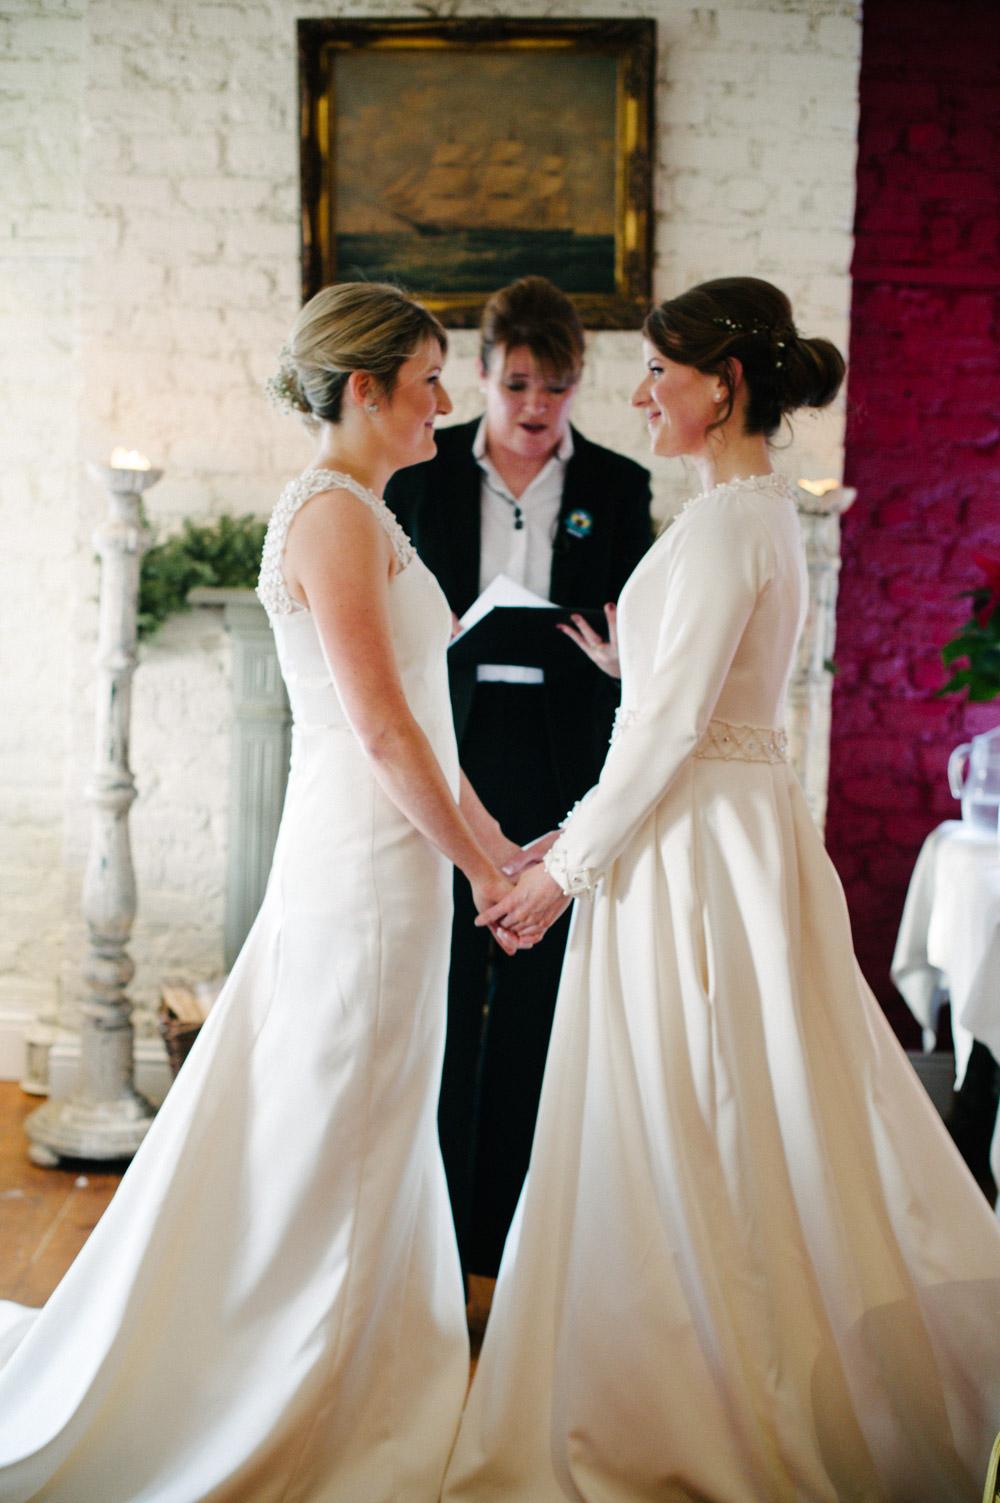 Same Sex Wedding Ceremony Photograph in Dublin